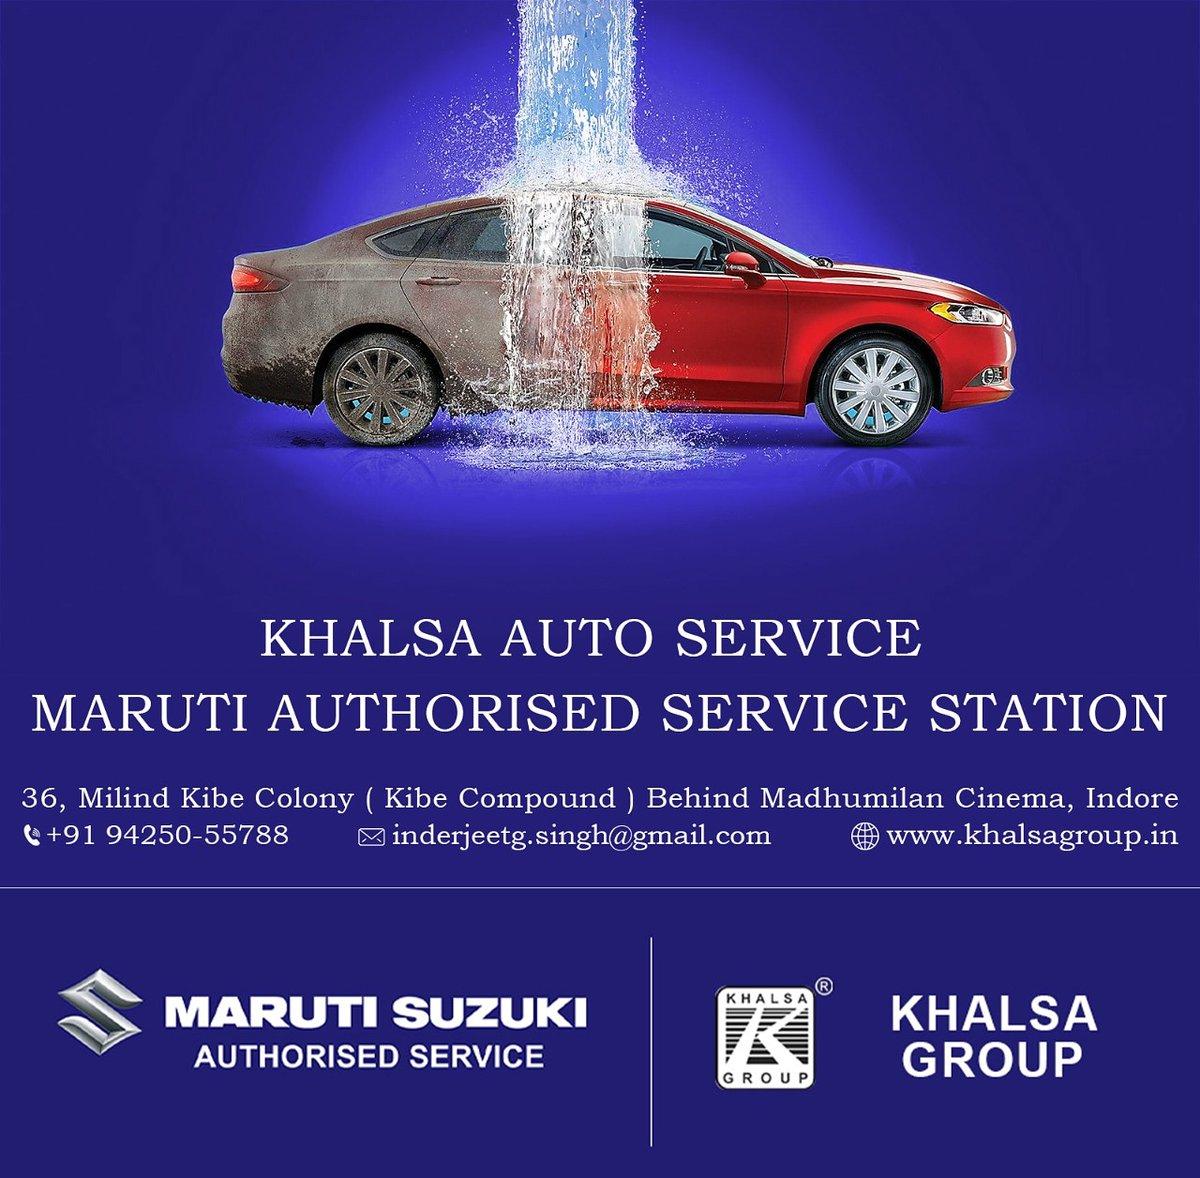 Complete Car Care Maruti Suzuki Authorised Service KHALSA GROUP #Maruti #khalsagroup #MarutiSuzuki  #indore https://t.co/0izgRMJRxx